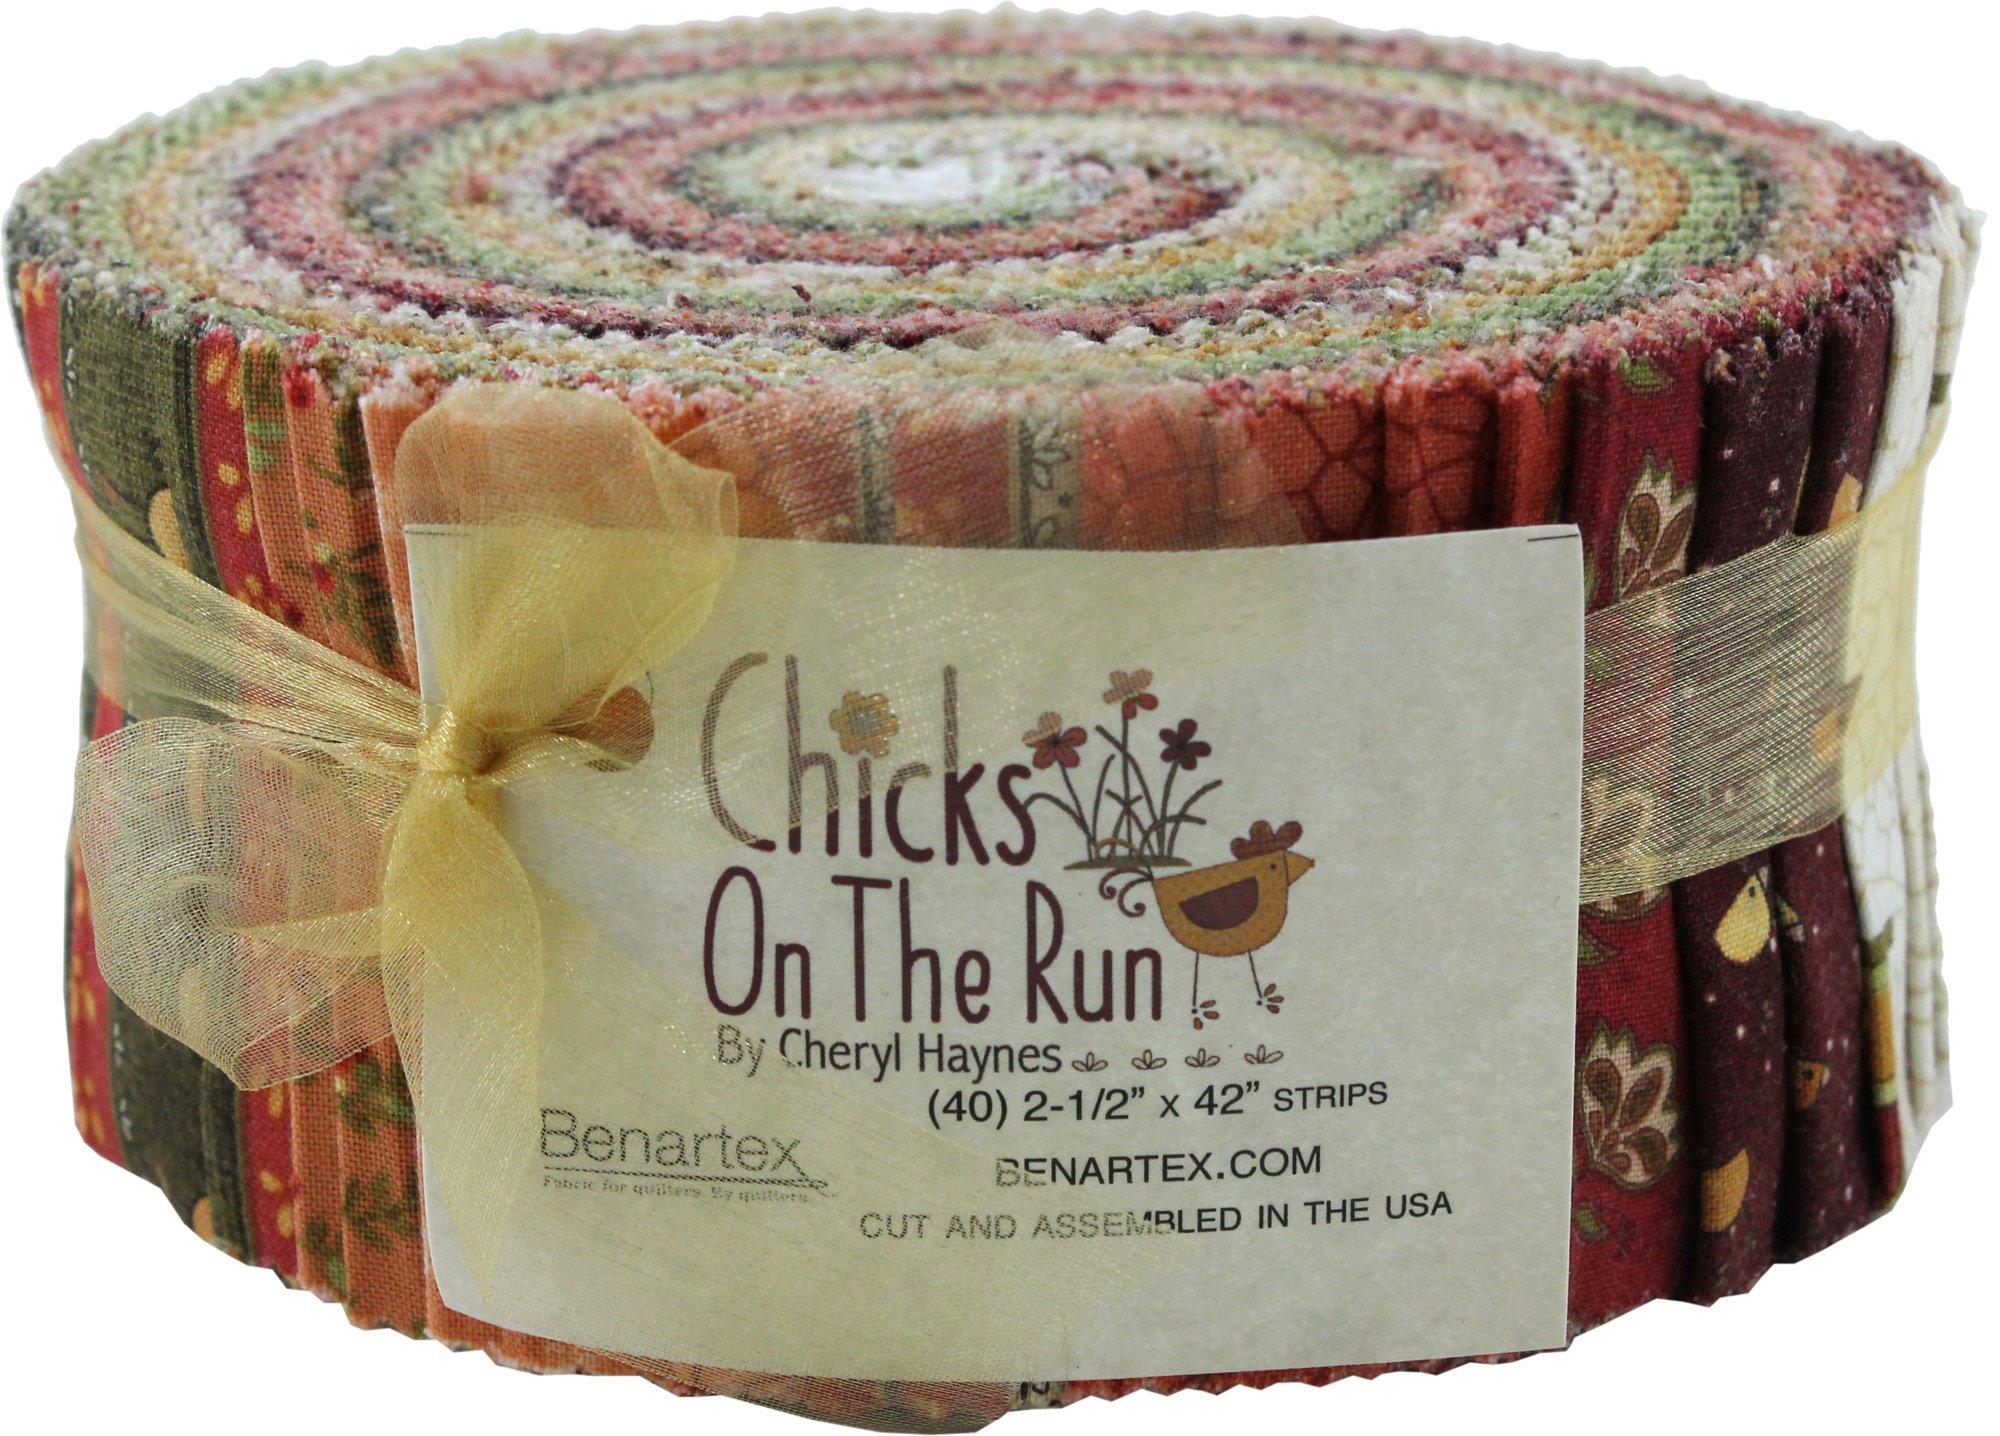 Cheryl Haynes Chicks on the Run Pinwheel 40 2.5-inch Strips Jelly Roll Benartex, Assorted by Benartex (Image #1)